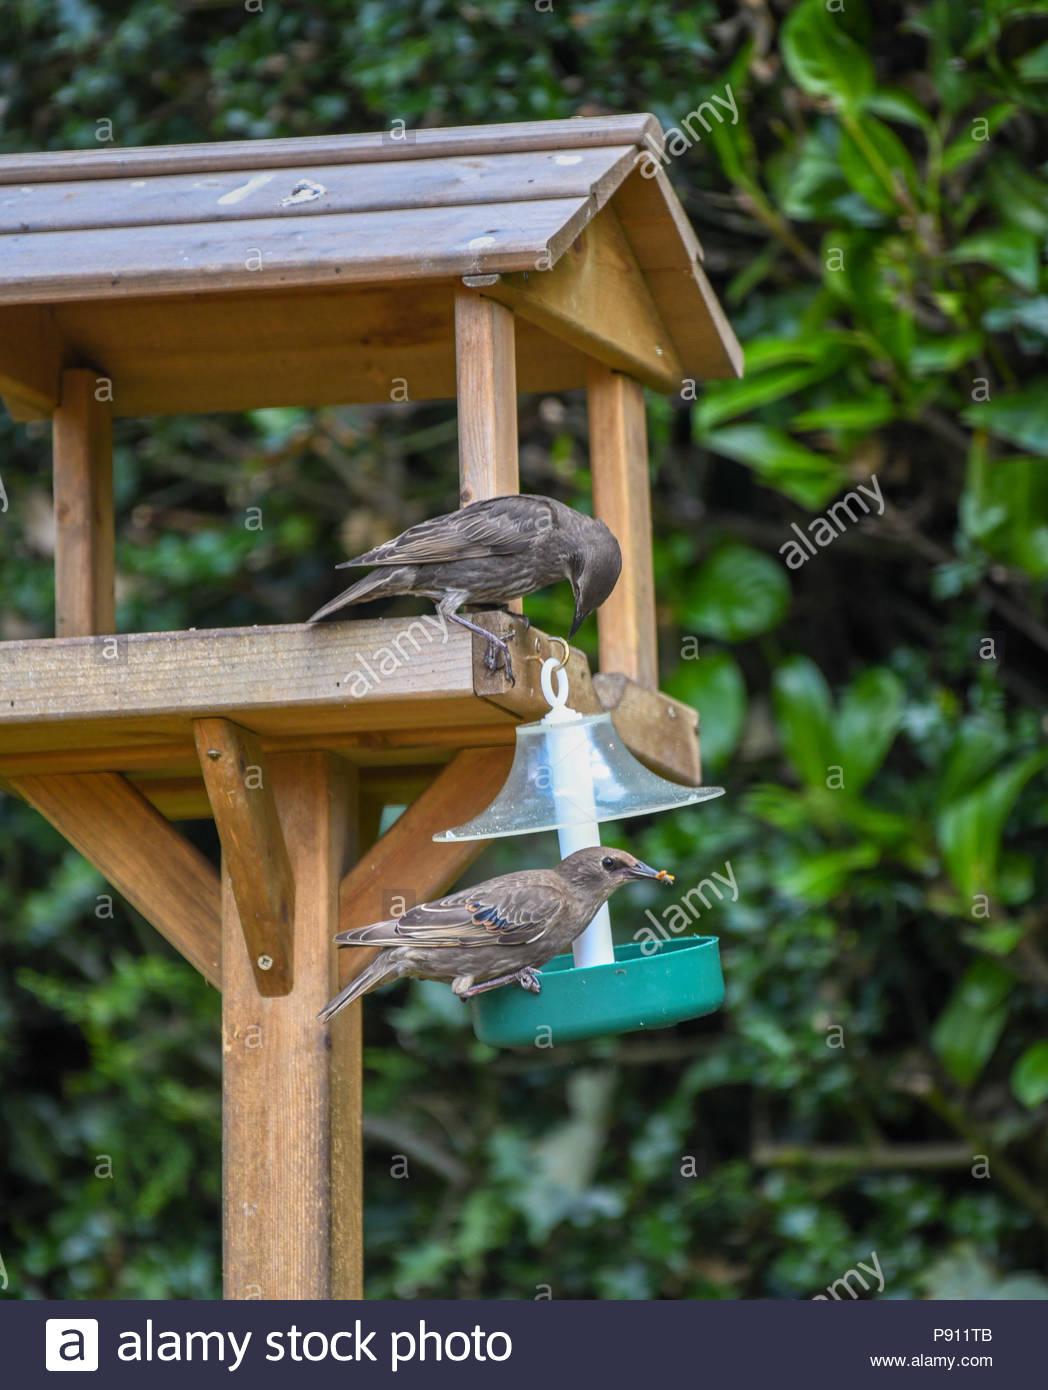 Juvenile starlings feeding on a bird table in an English country garden - Stock Image